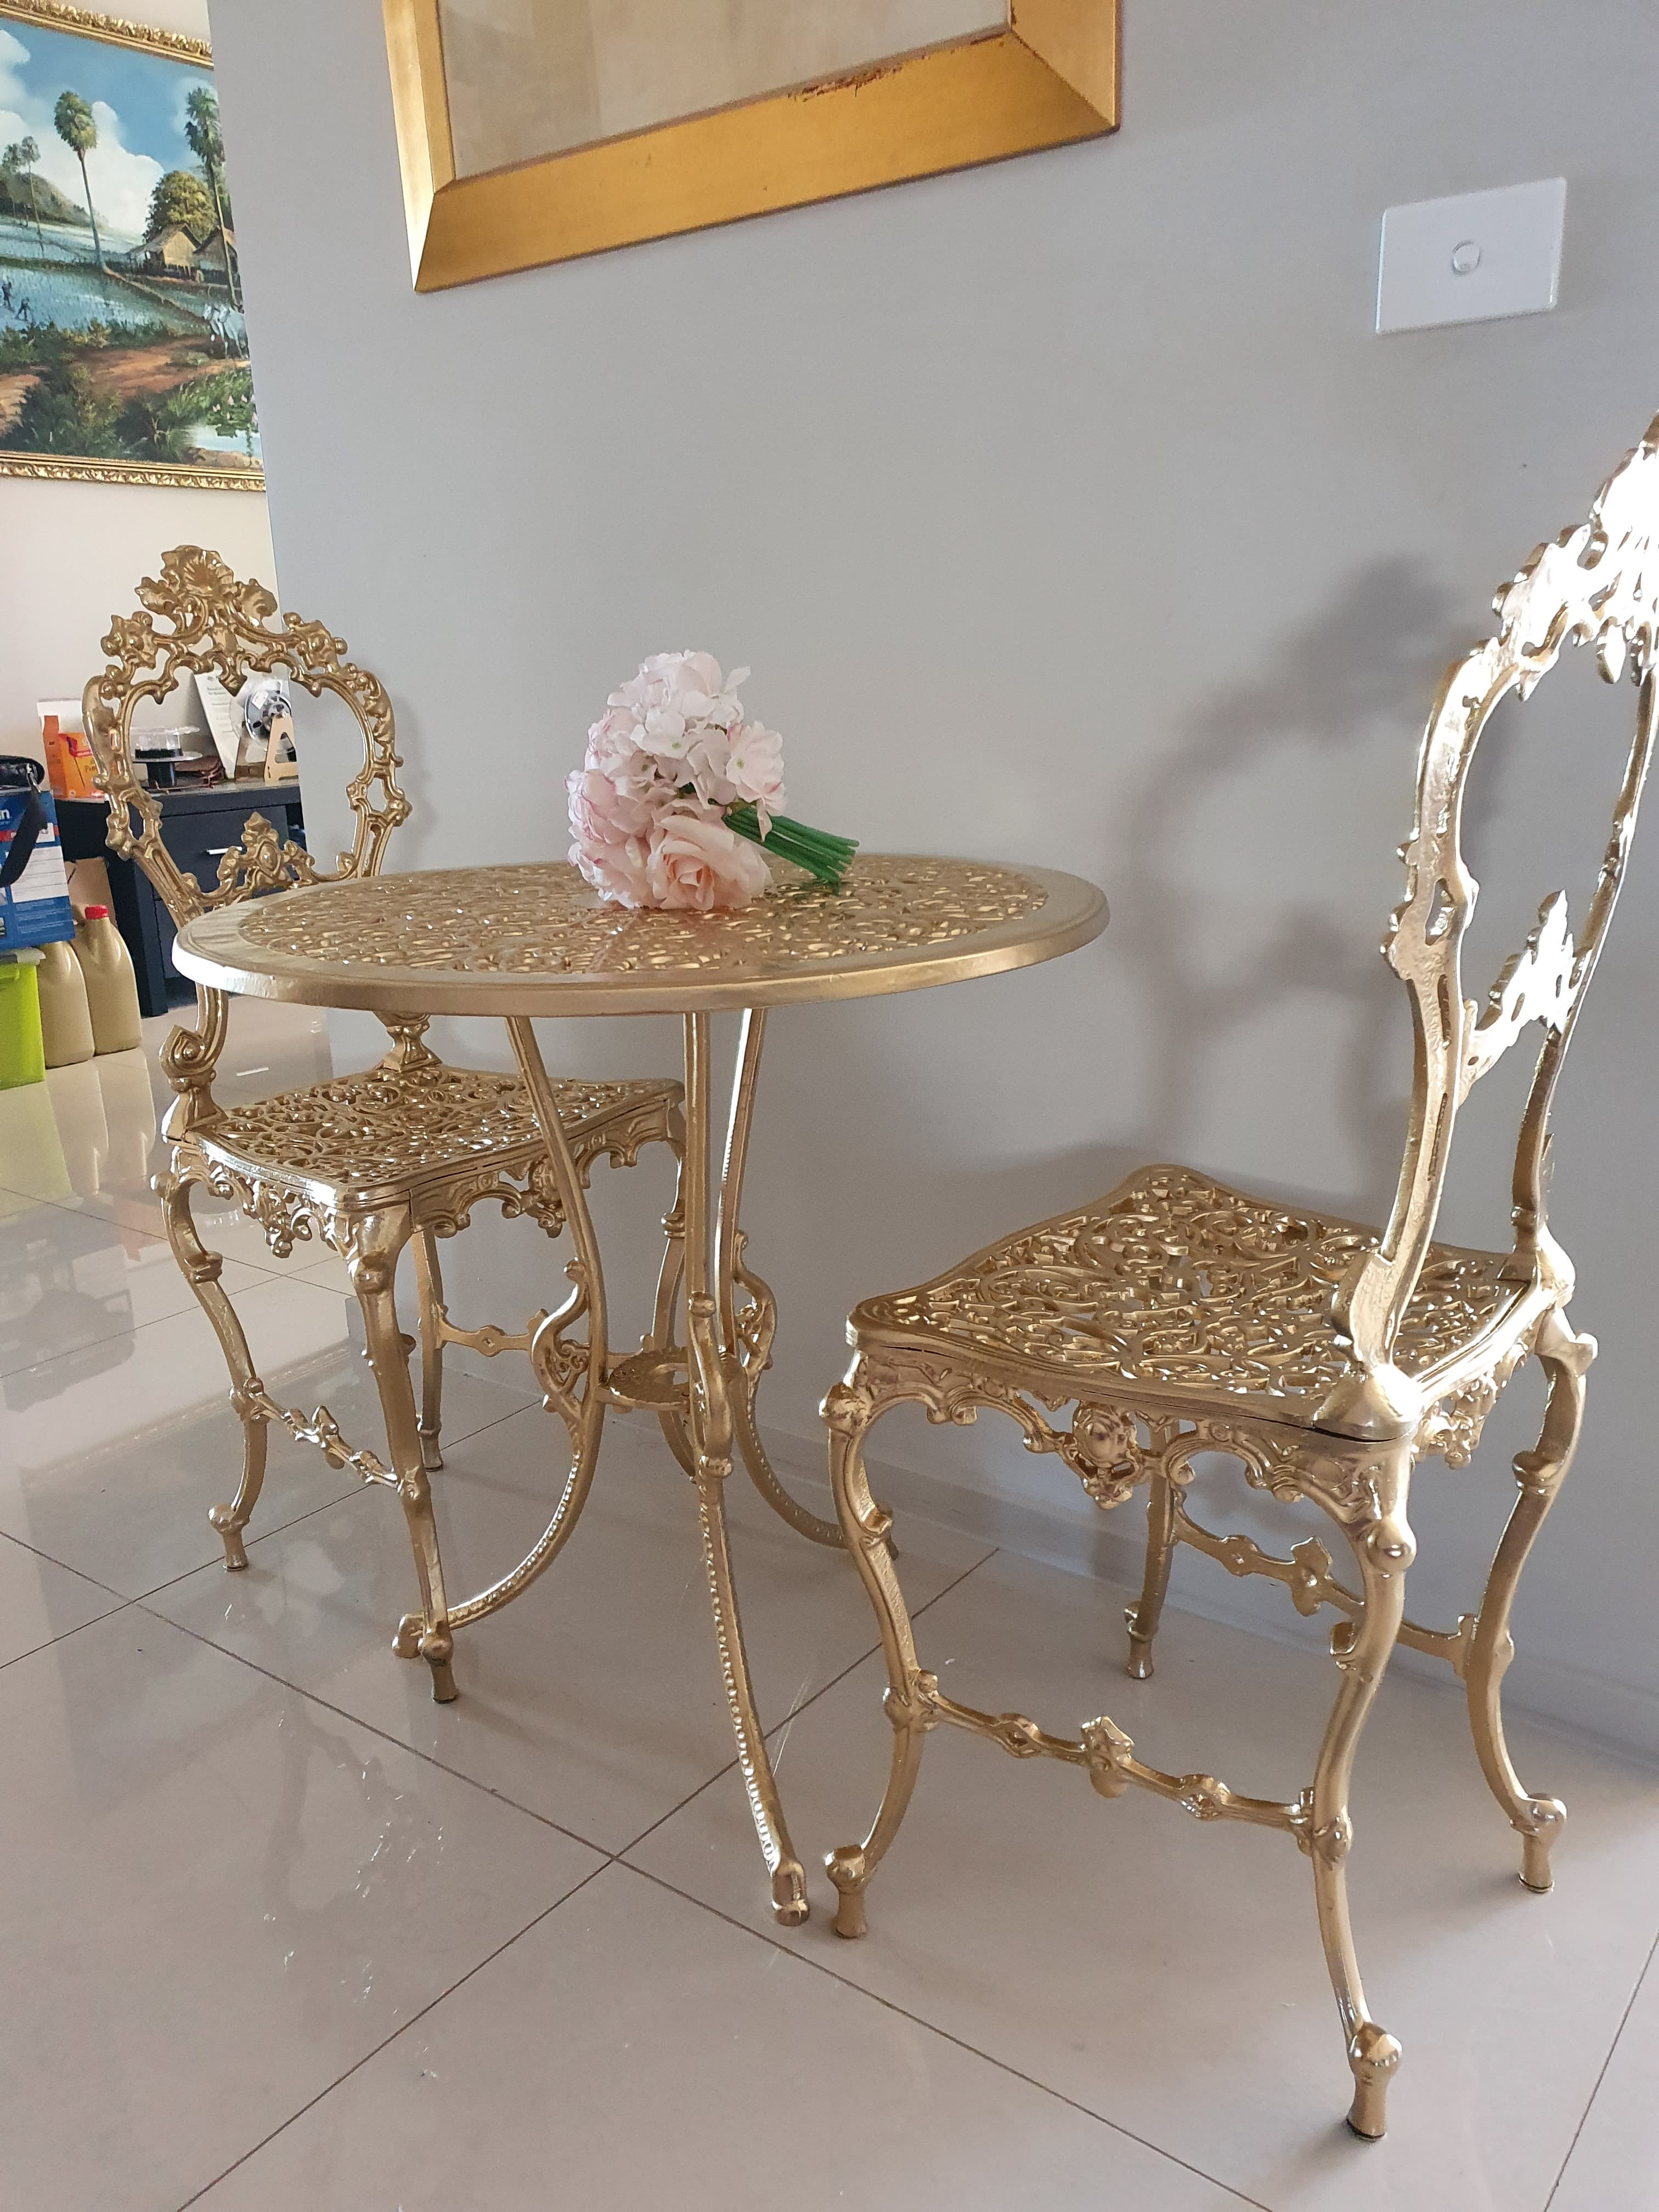 Furniture & Props Hire